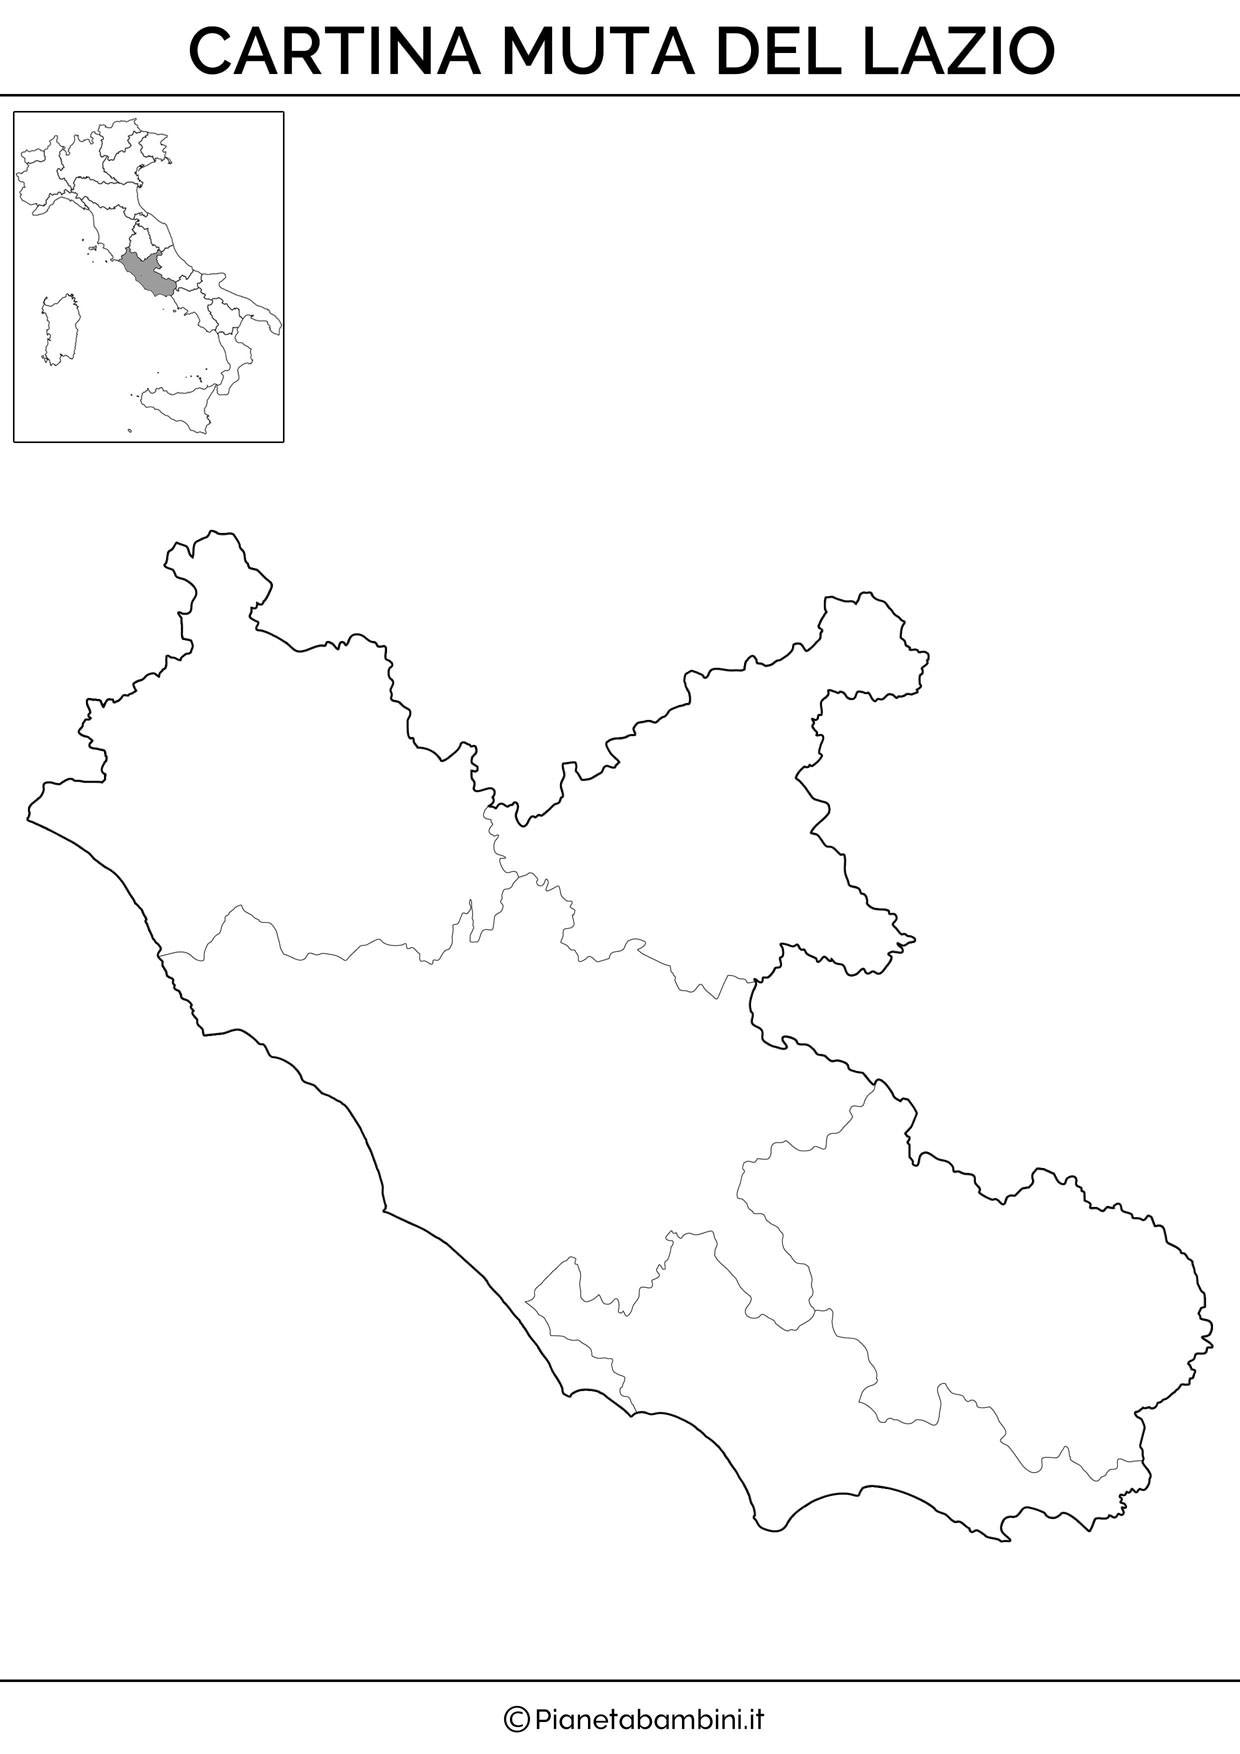 Cartina Del Lazio Muta Pieterduisenberg